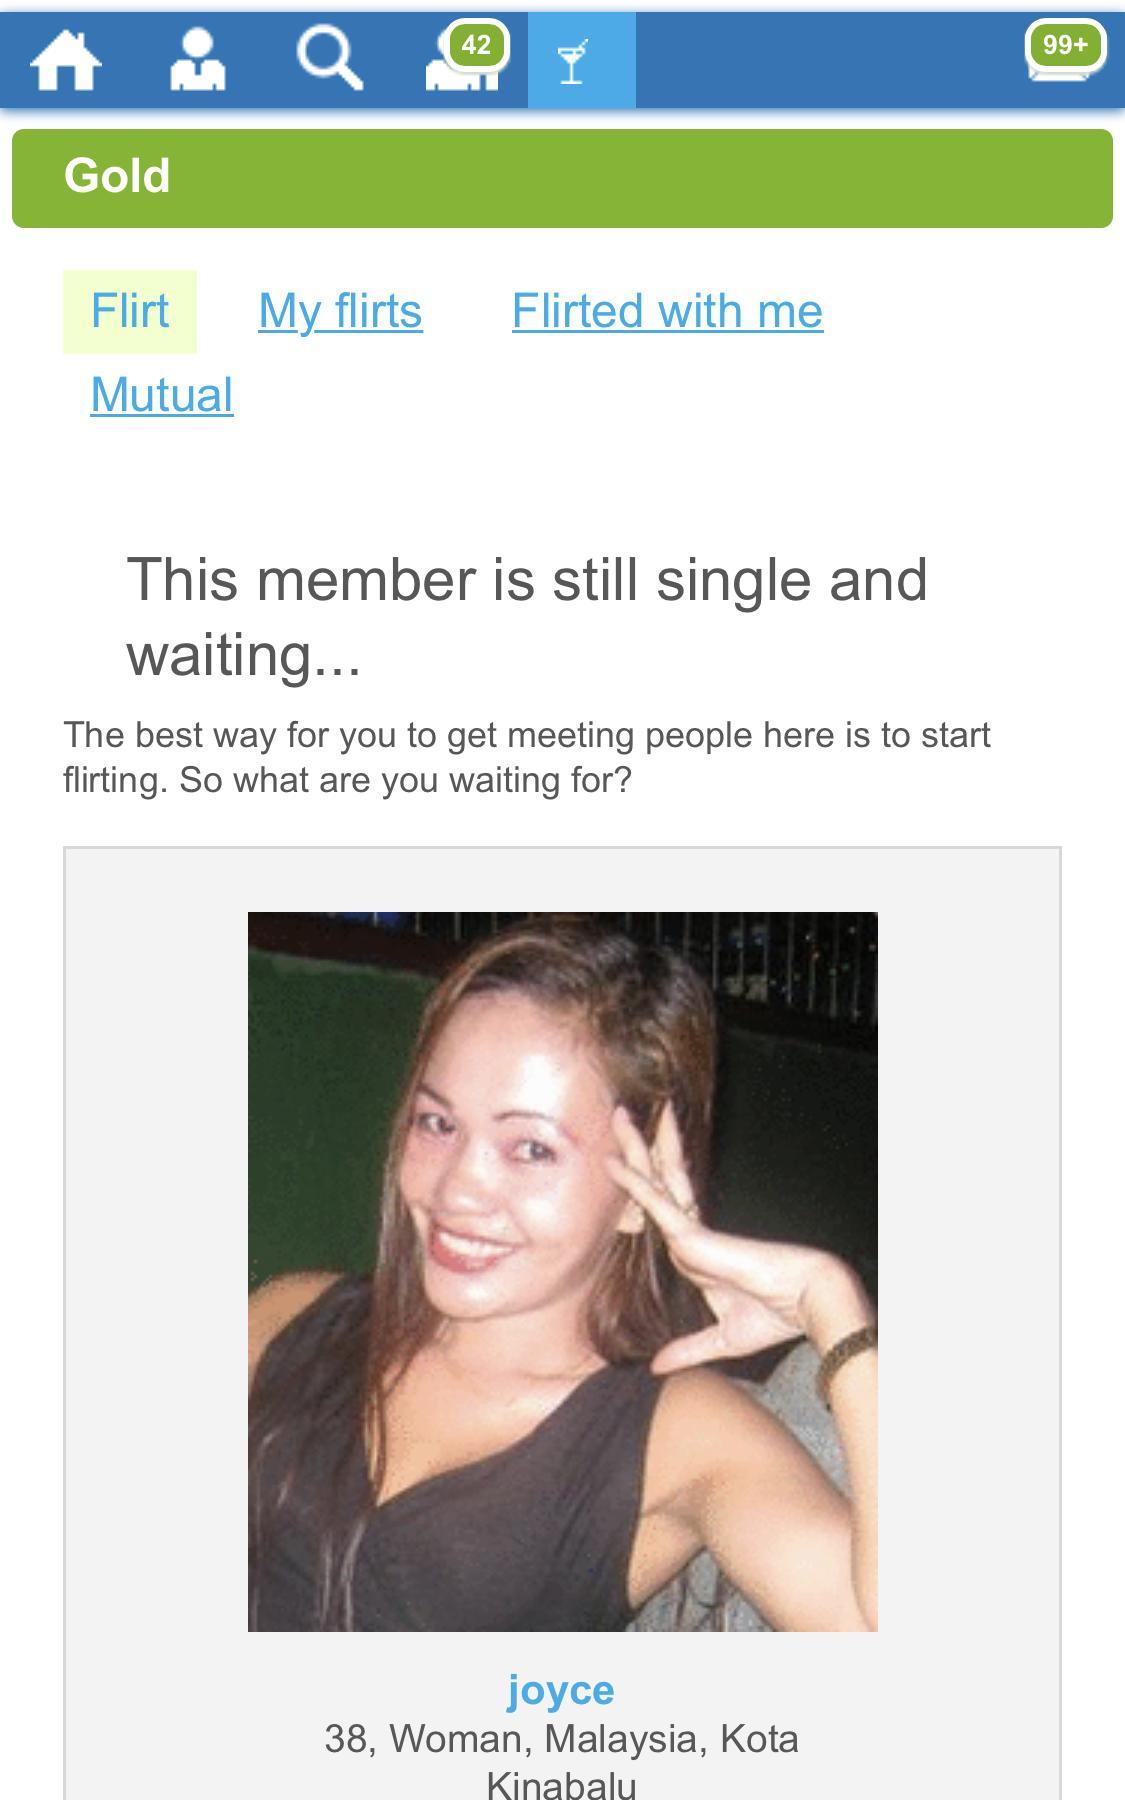 Uusi Malesia dating site turvallinen online dating sites ilmaiseksi